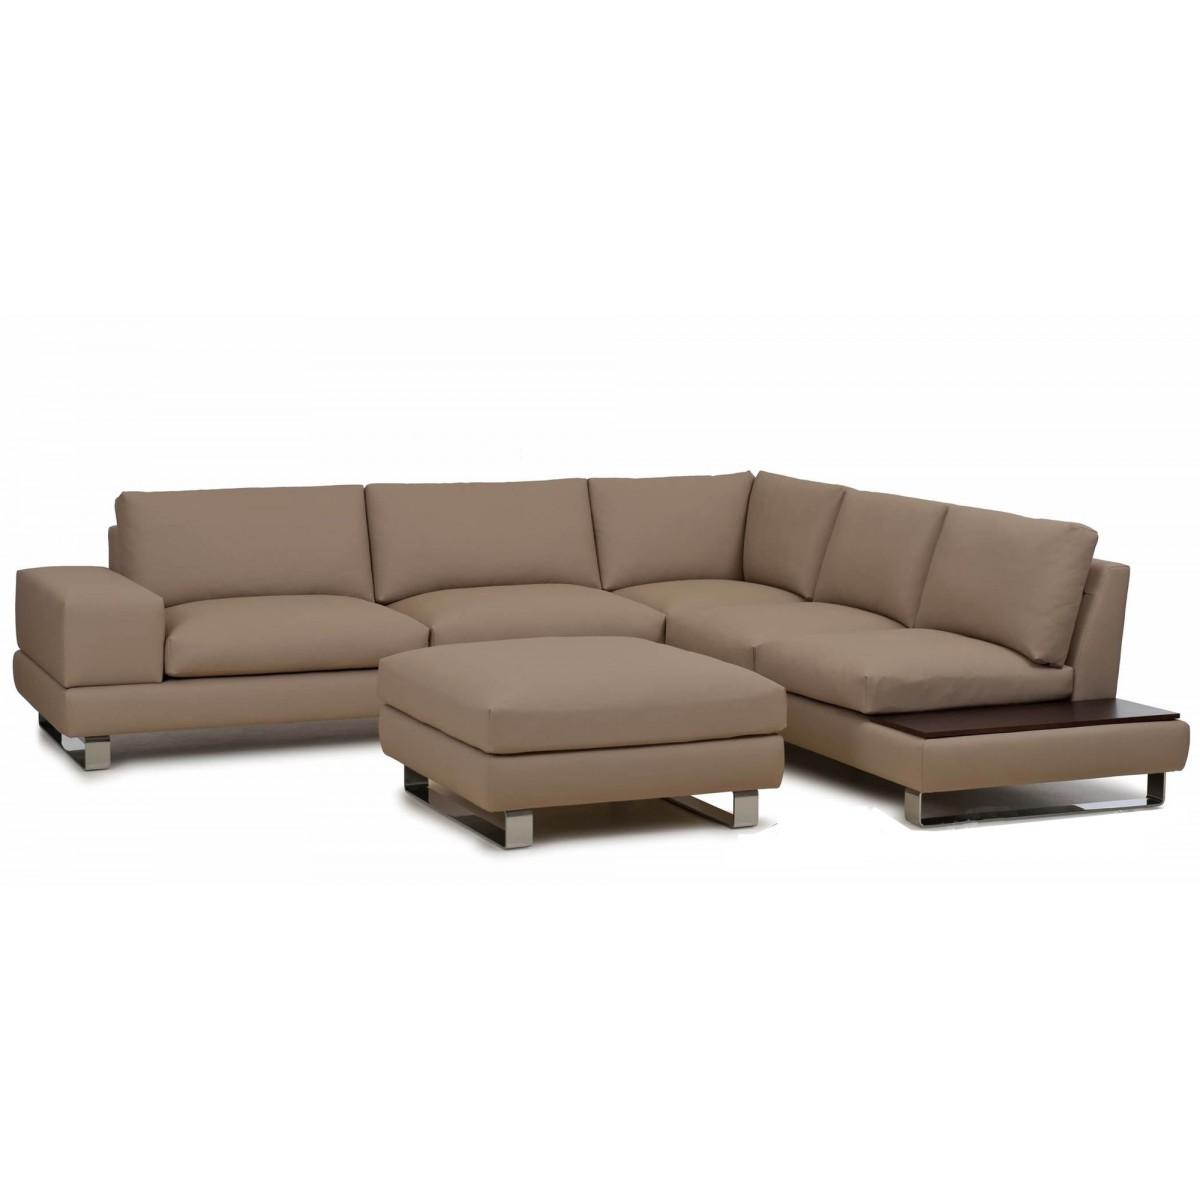 luzern ecksofa stoff i live design preisg nstig online moebel kaufen. Black Bedroom Furniture Sets. Home Design Ideas